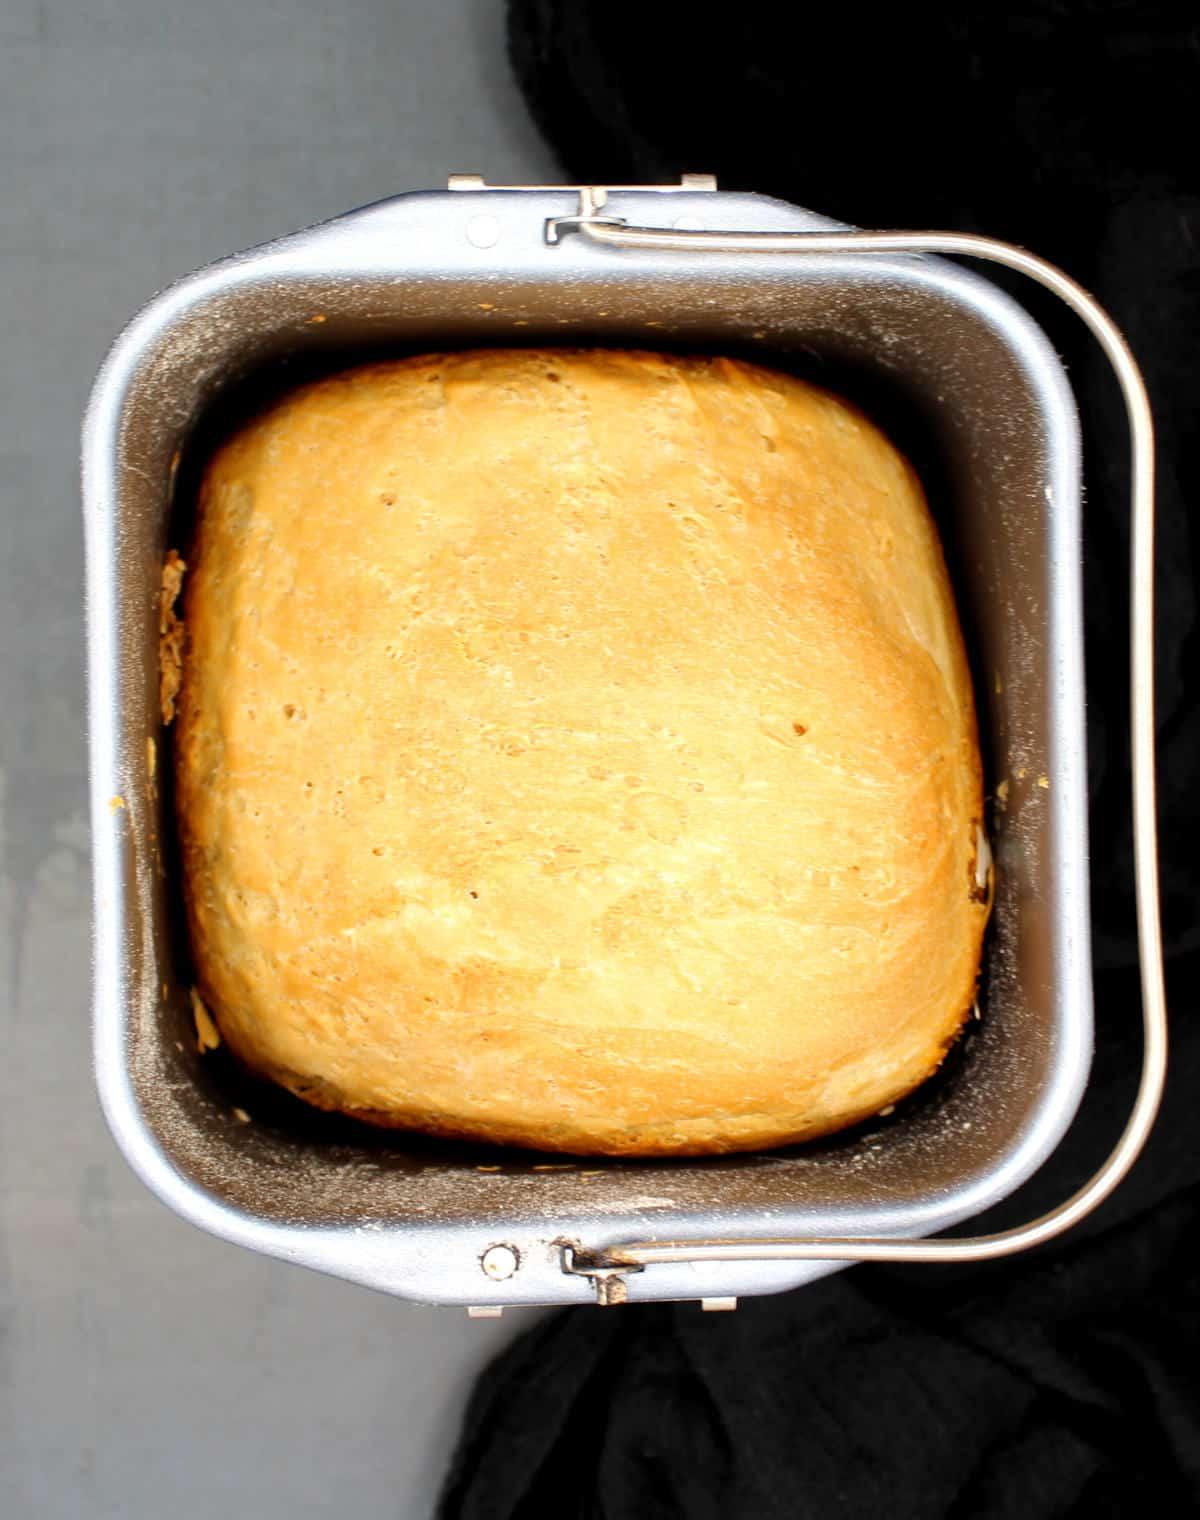 Sourdough loaf inside a breadmaker basket.